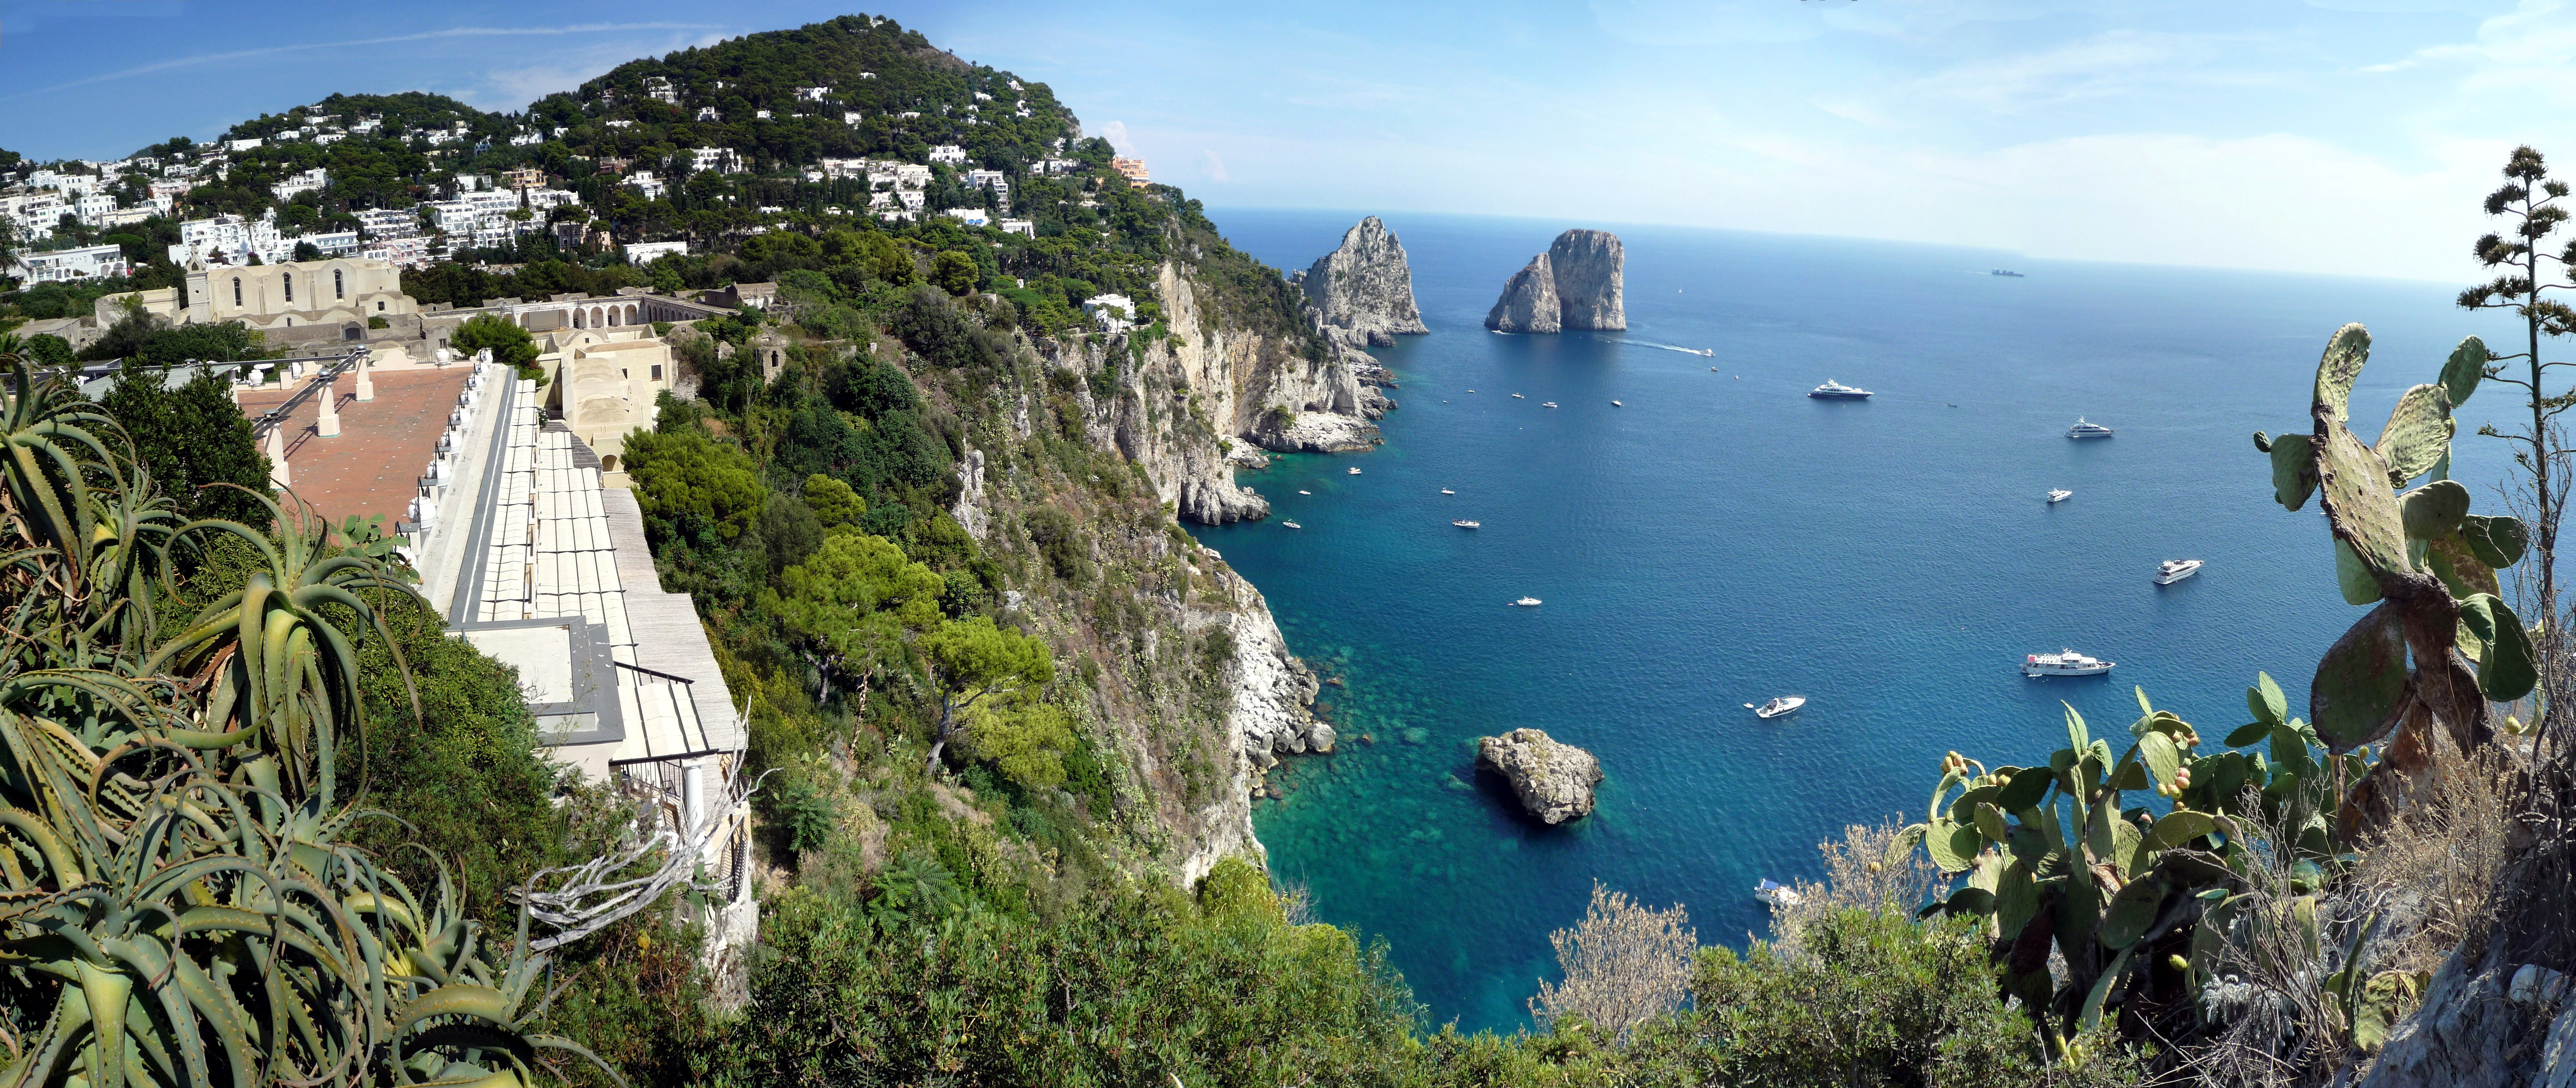 Grand Hotel Capri